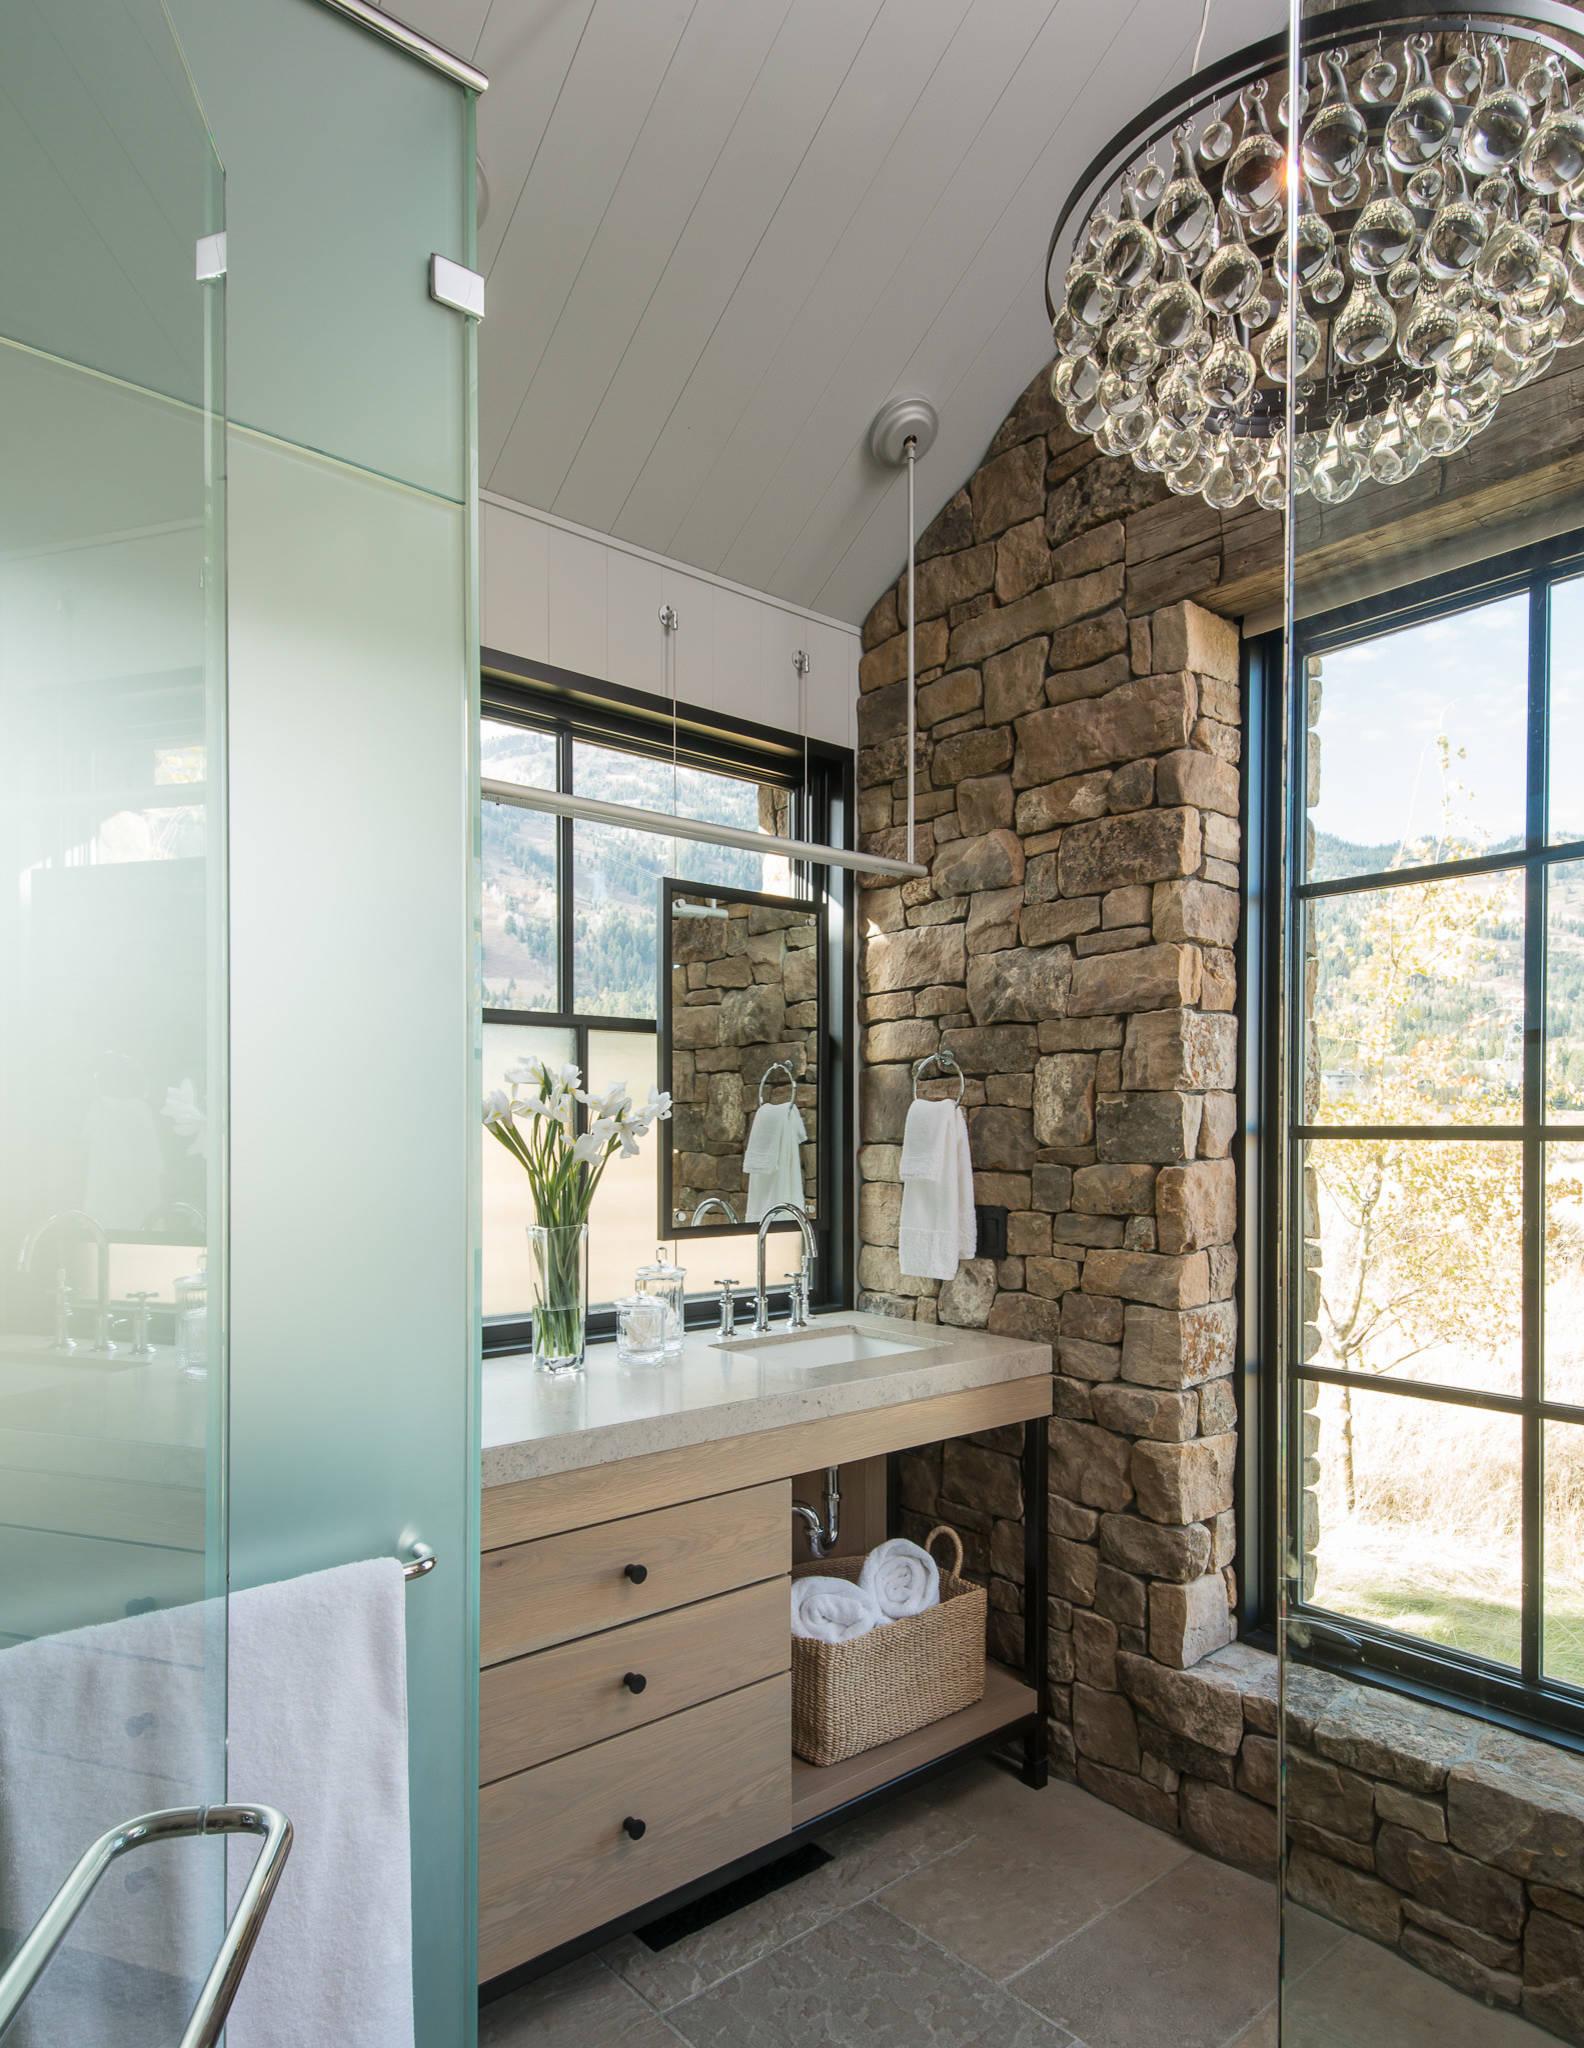 16 Fantastic Rustic Bathroom Designs That Will Take Your ... on Restroom Ideas  id=39213